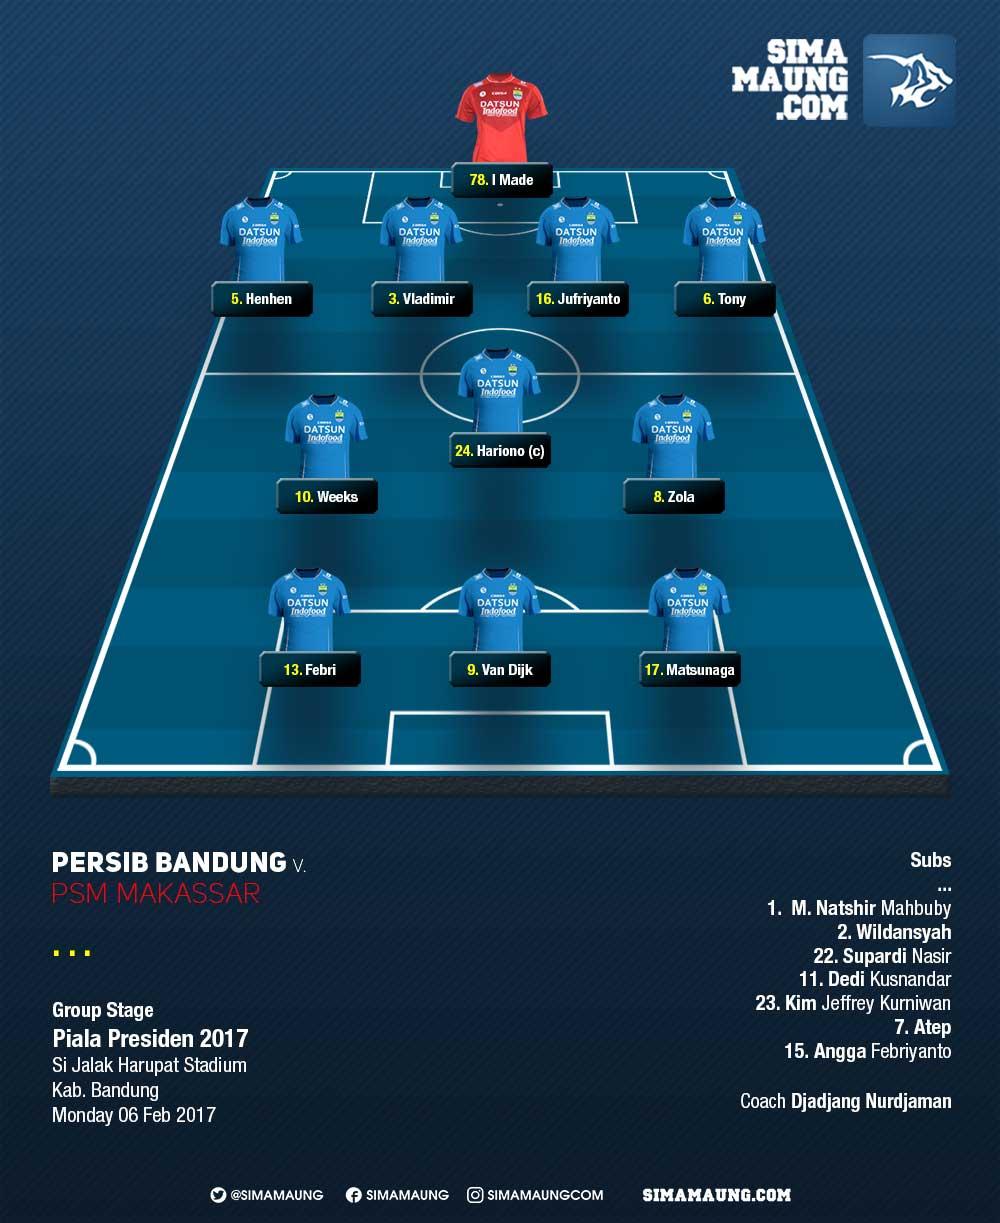 Persib Bandung Berita Online   simamaung.com » Persib vs PSM 1-0 (FT)